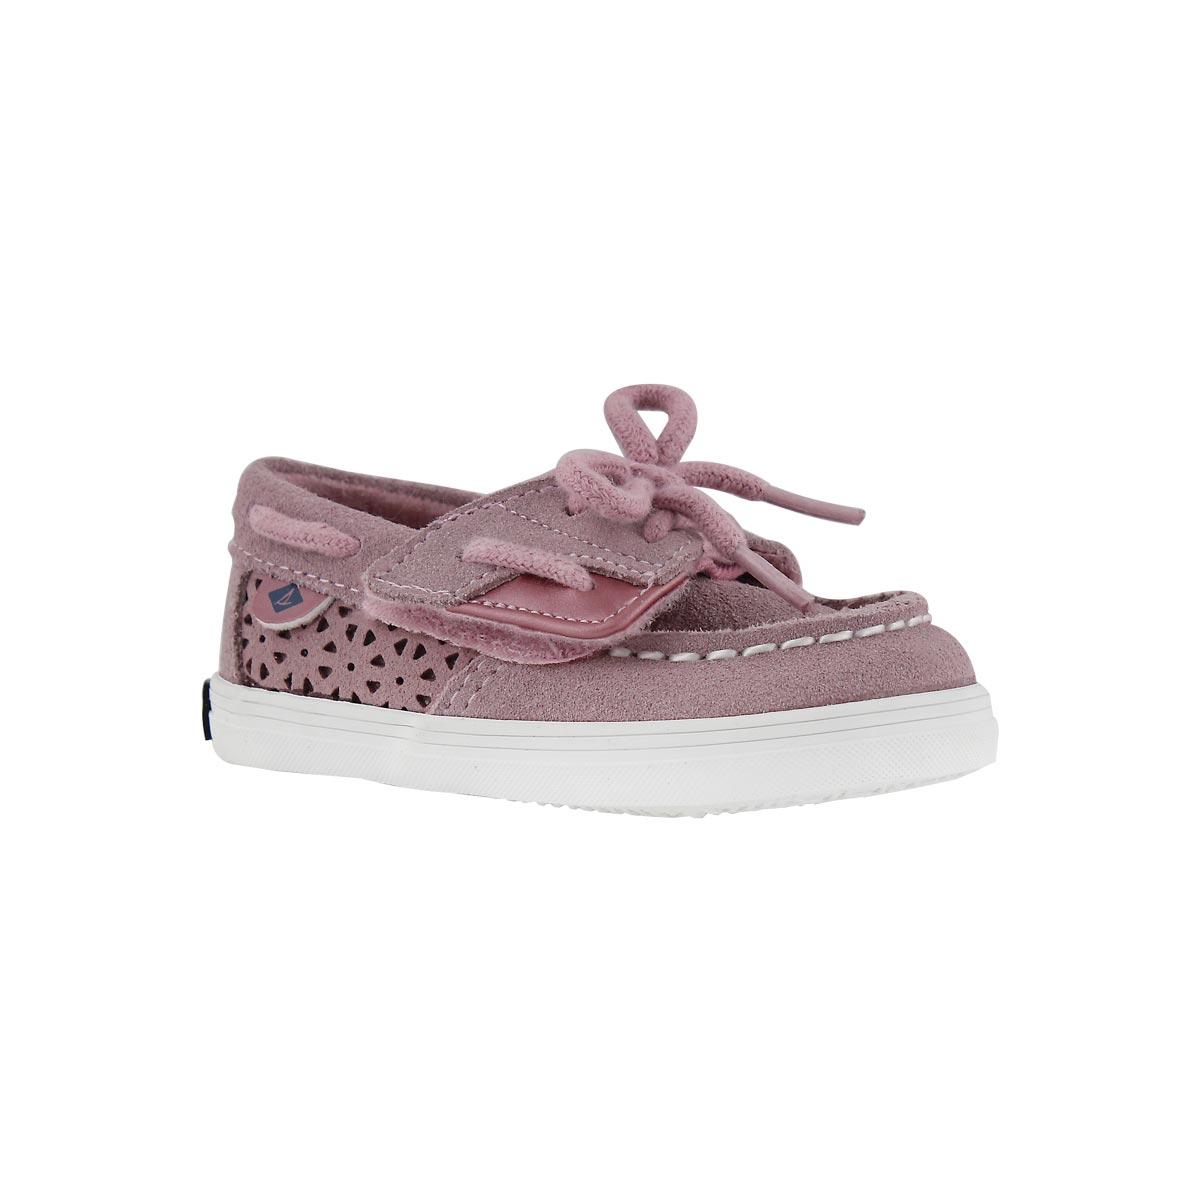 Inf-g Bluefish Crib Jr. rose boat shoe